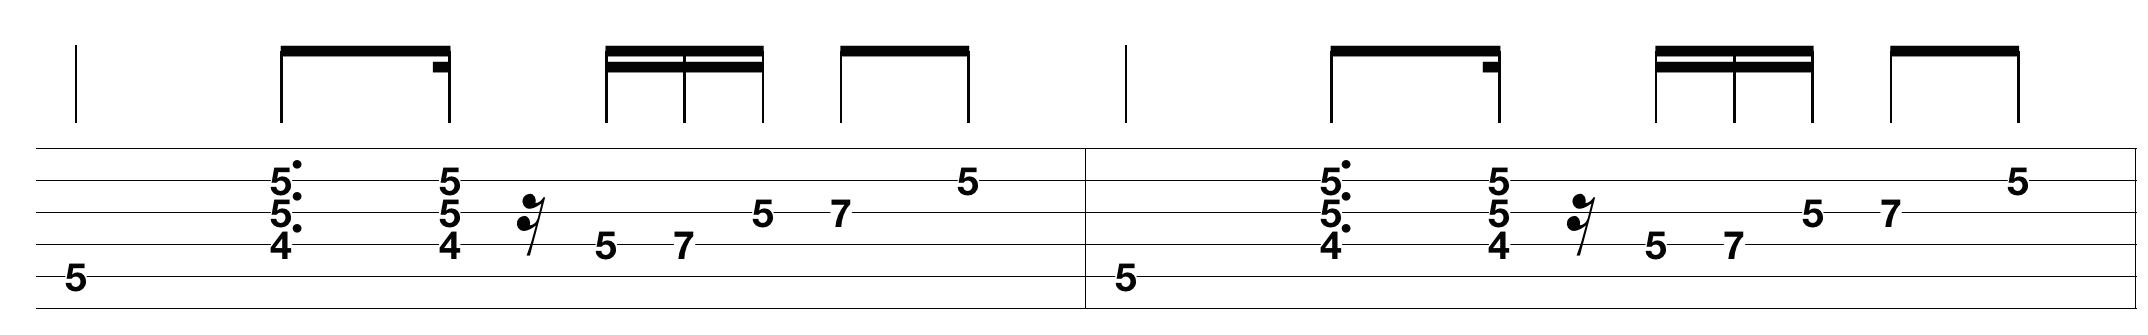 rhythm-guitars_2.png